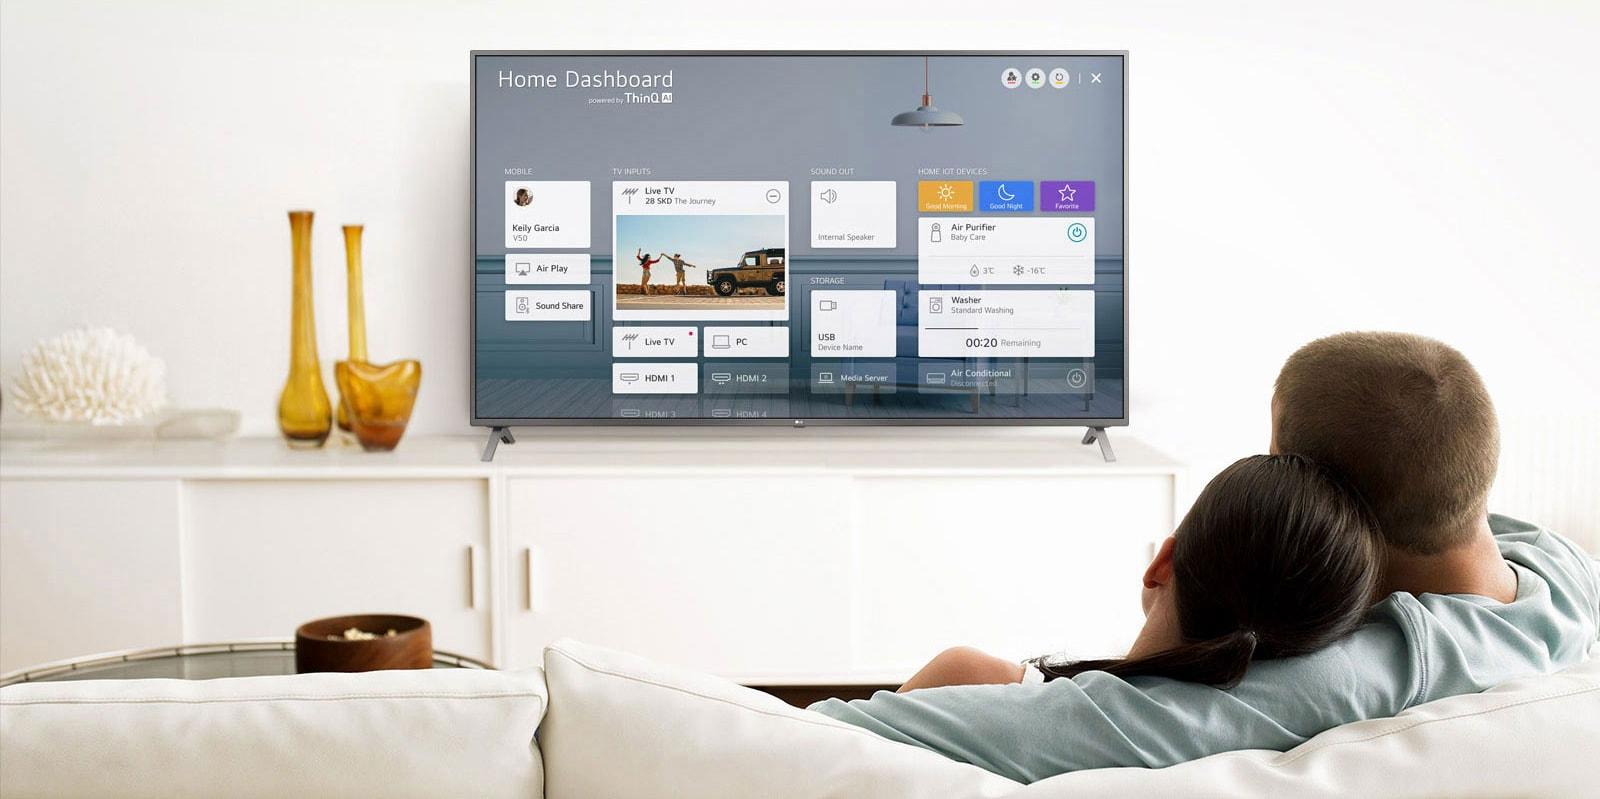 https://www.lg.com/hu/images/televiziok/md07502471/features/TV-UHD-03-ThinQ-AI-Desktop.jpg